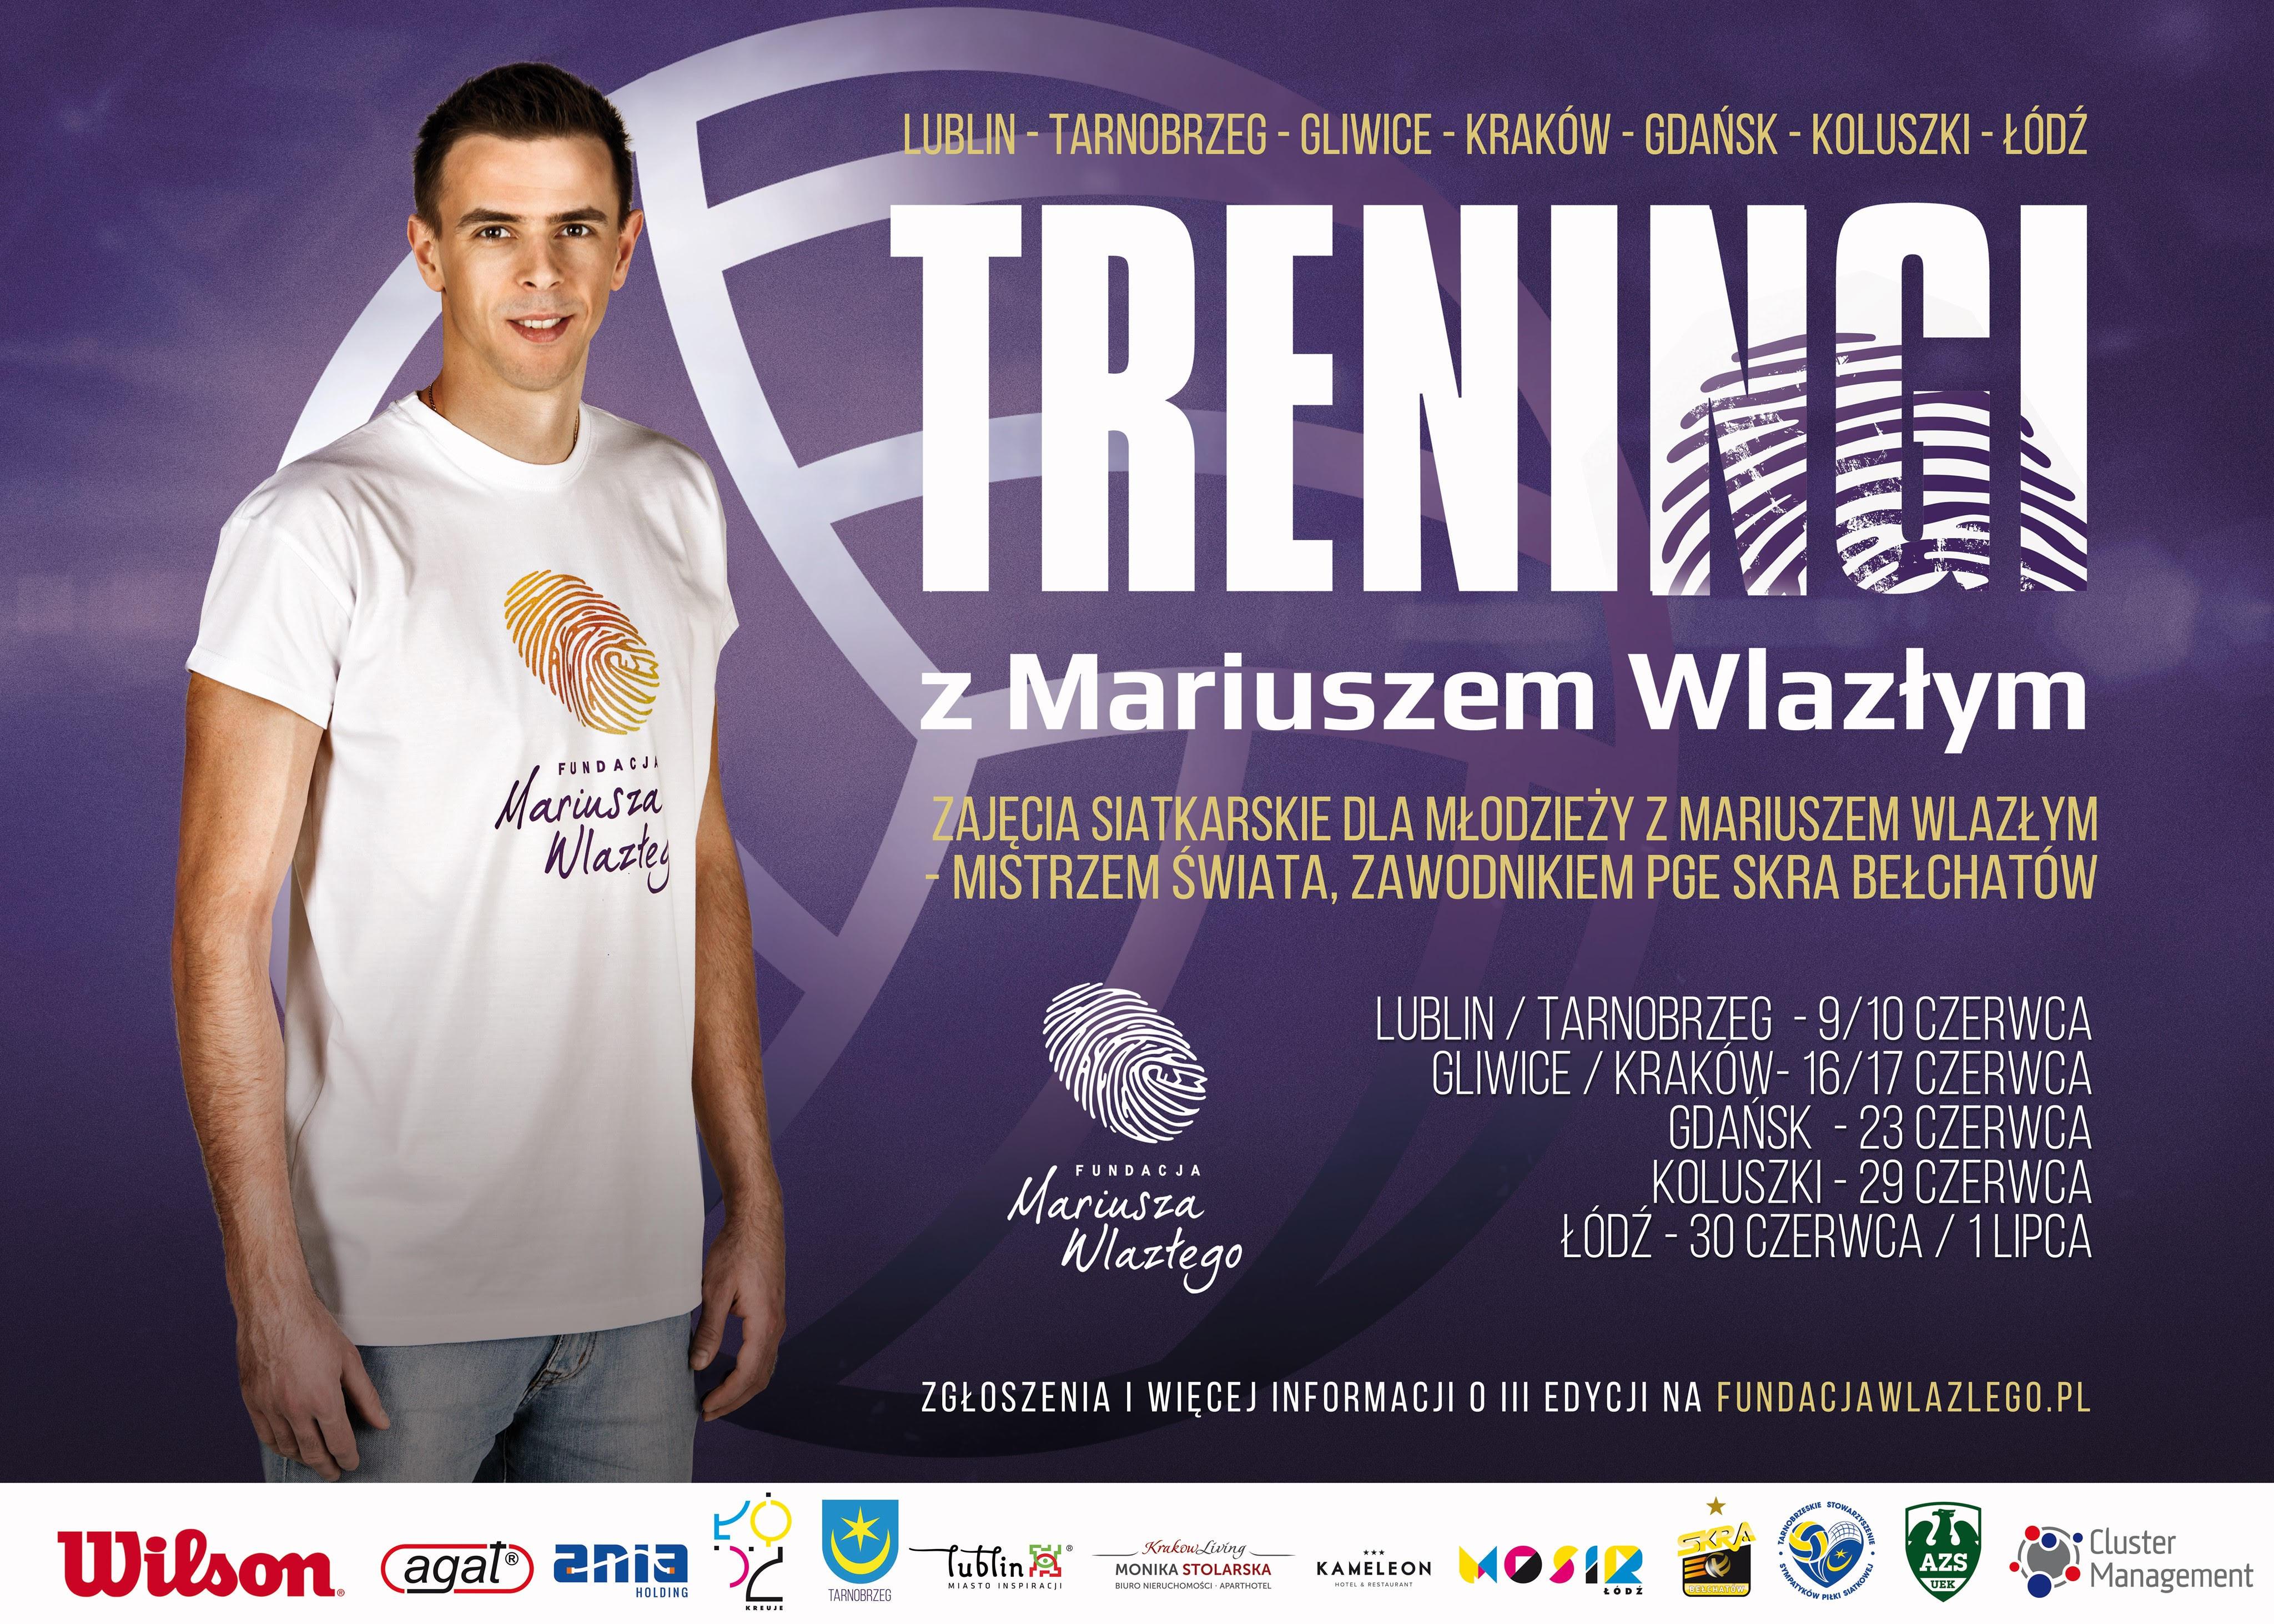 http://tssps.tarnobrzeg.pl/wp-content/uploads/2018/06/trening-z-Mariuszem.jpg